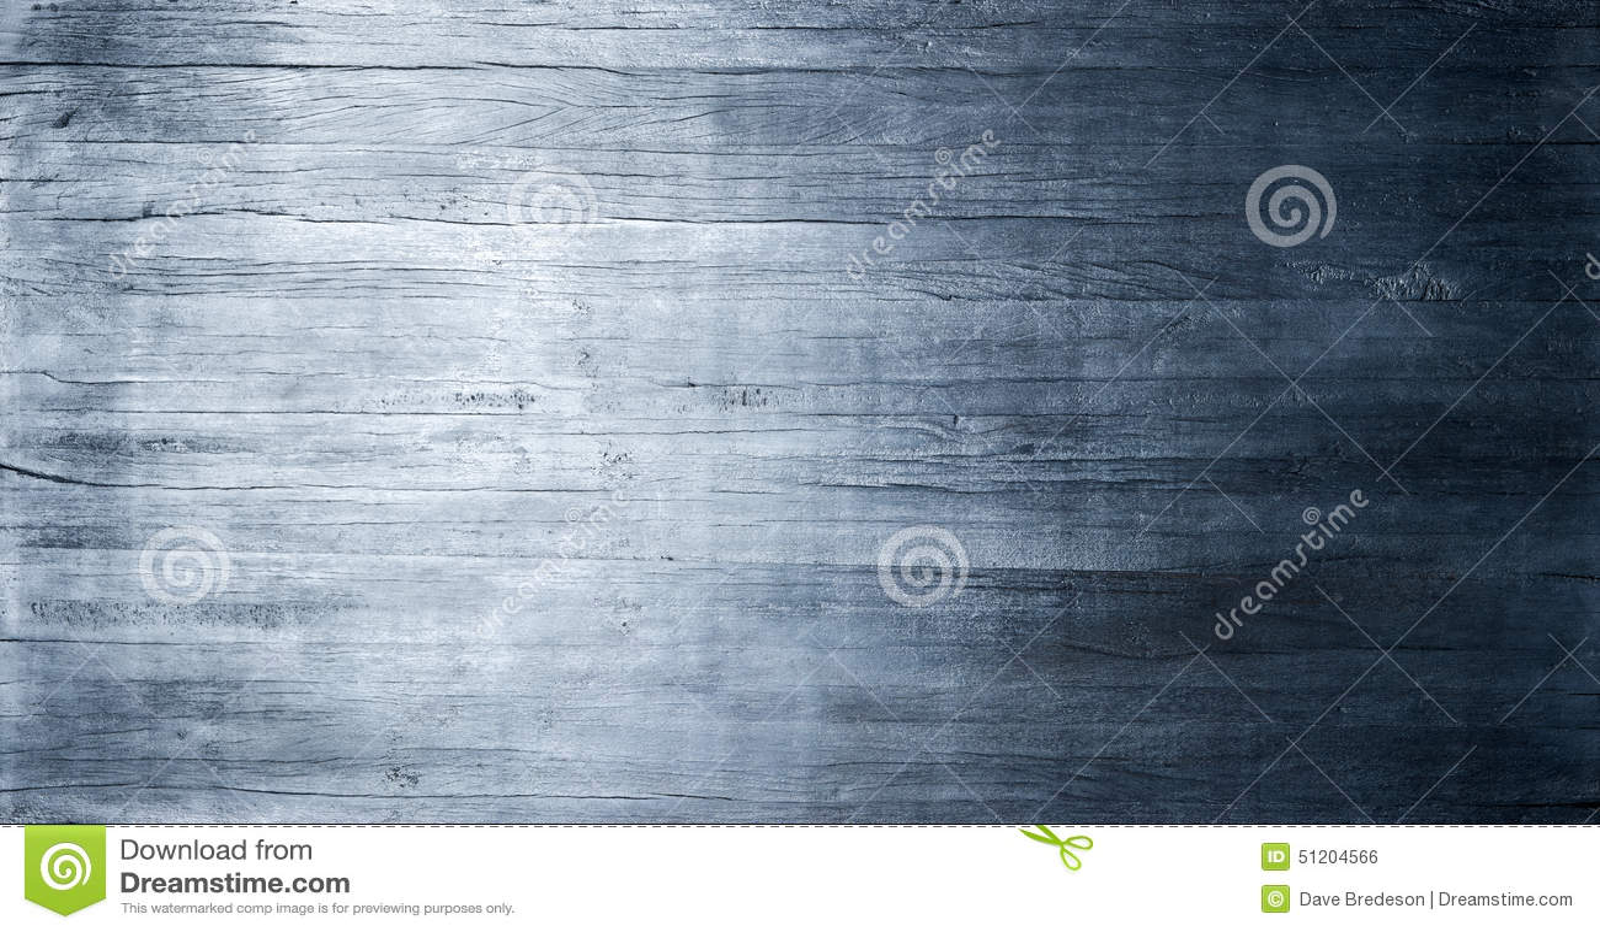 Blue Wood Metallic Texture Background